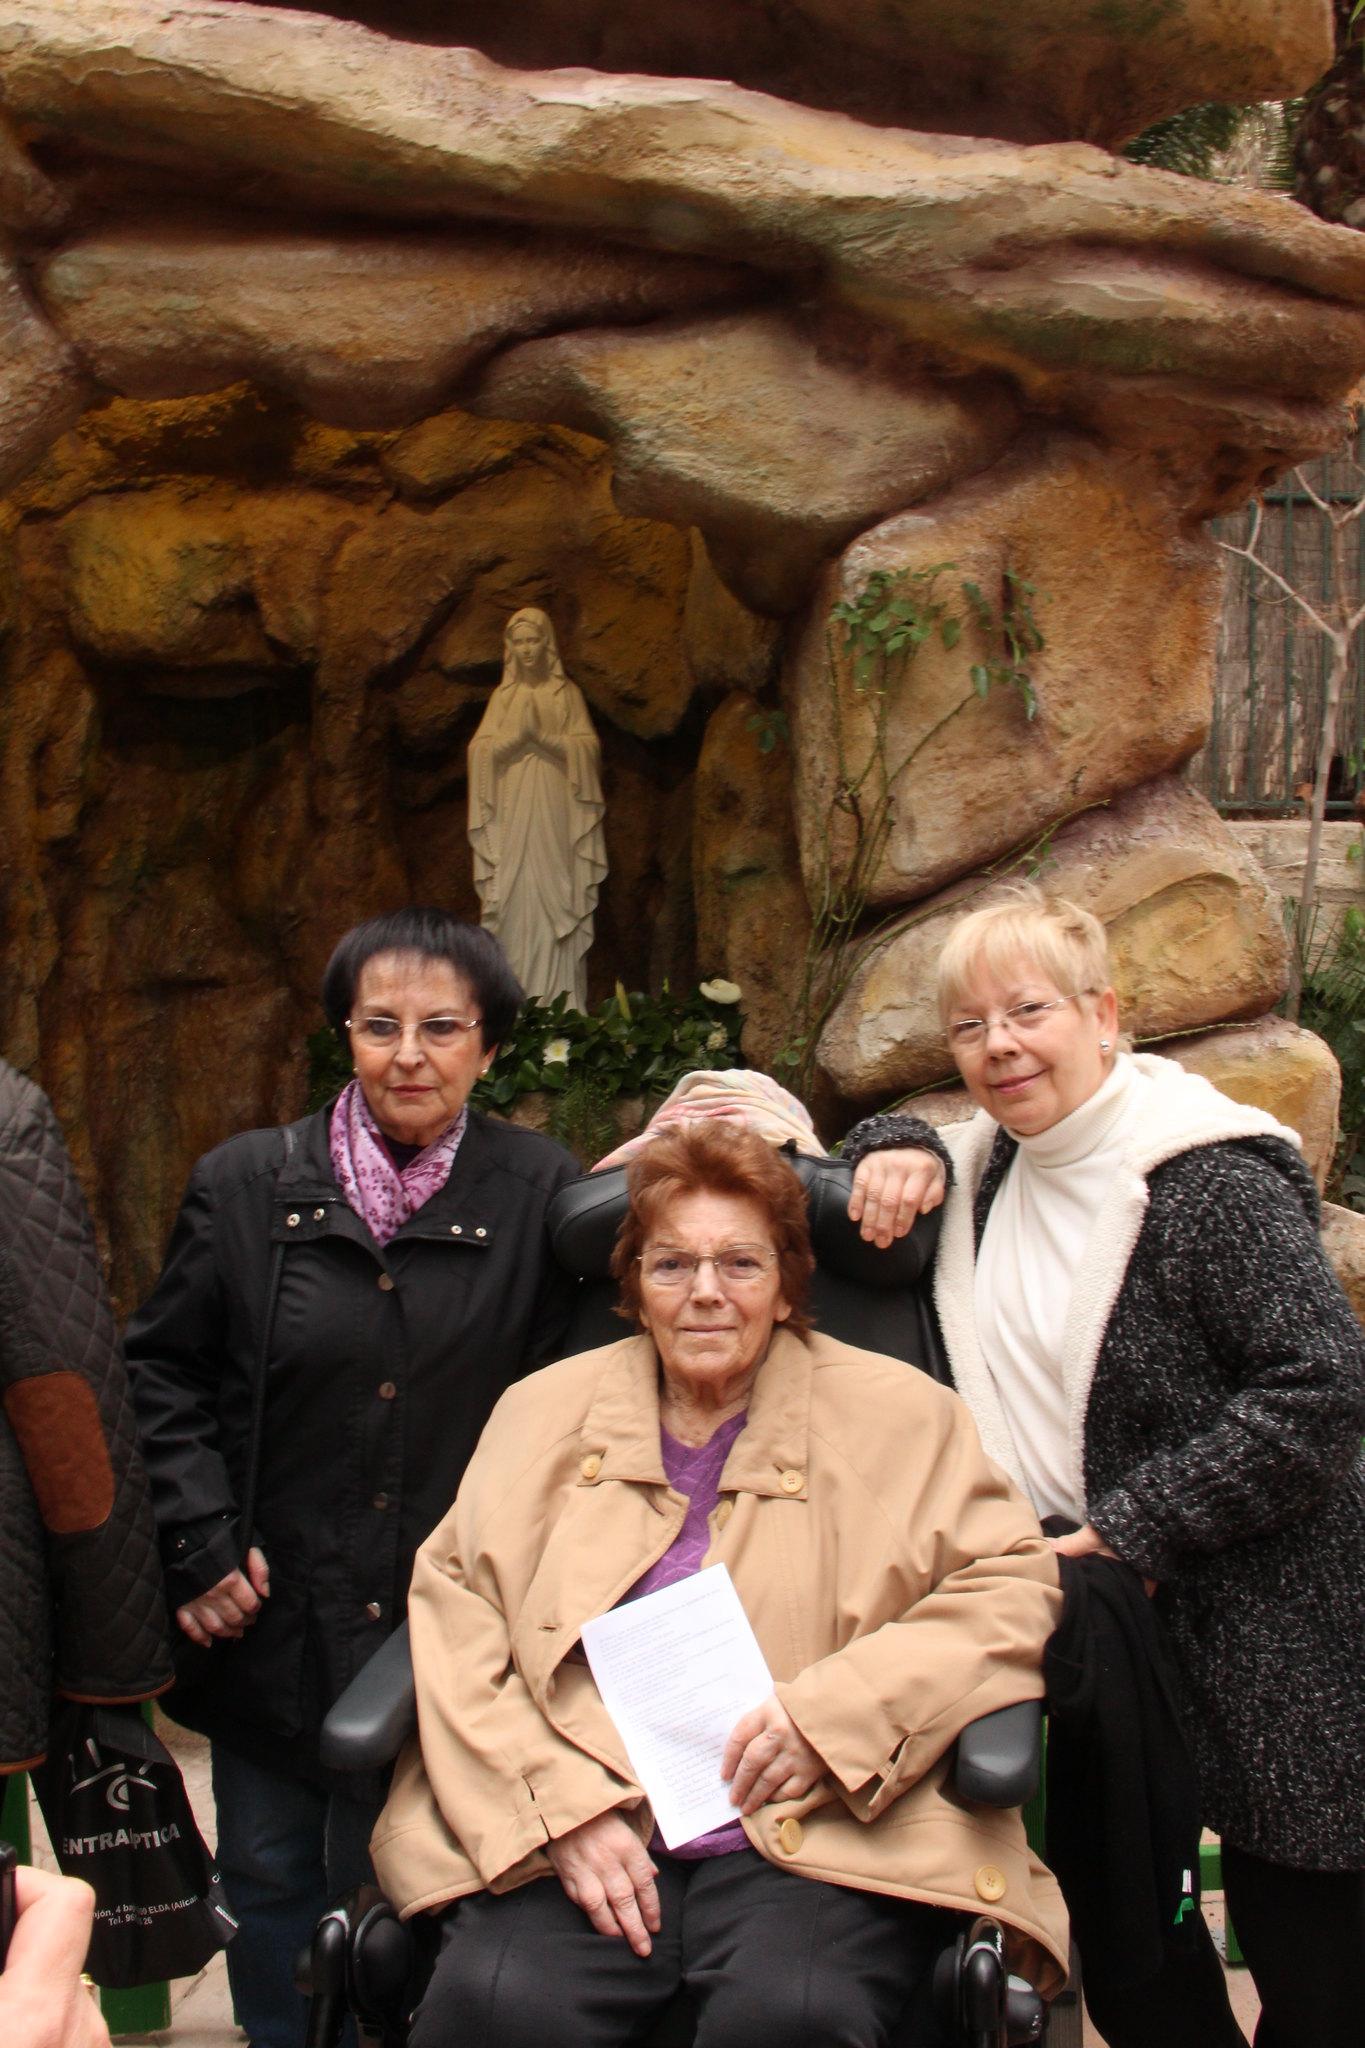 (2016-02-13) - Inauguración Virgen De Lourdes, La Molineta - Archivo La Molineta (107)